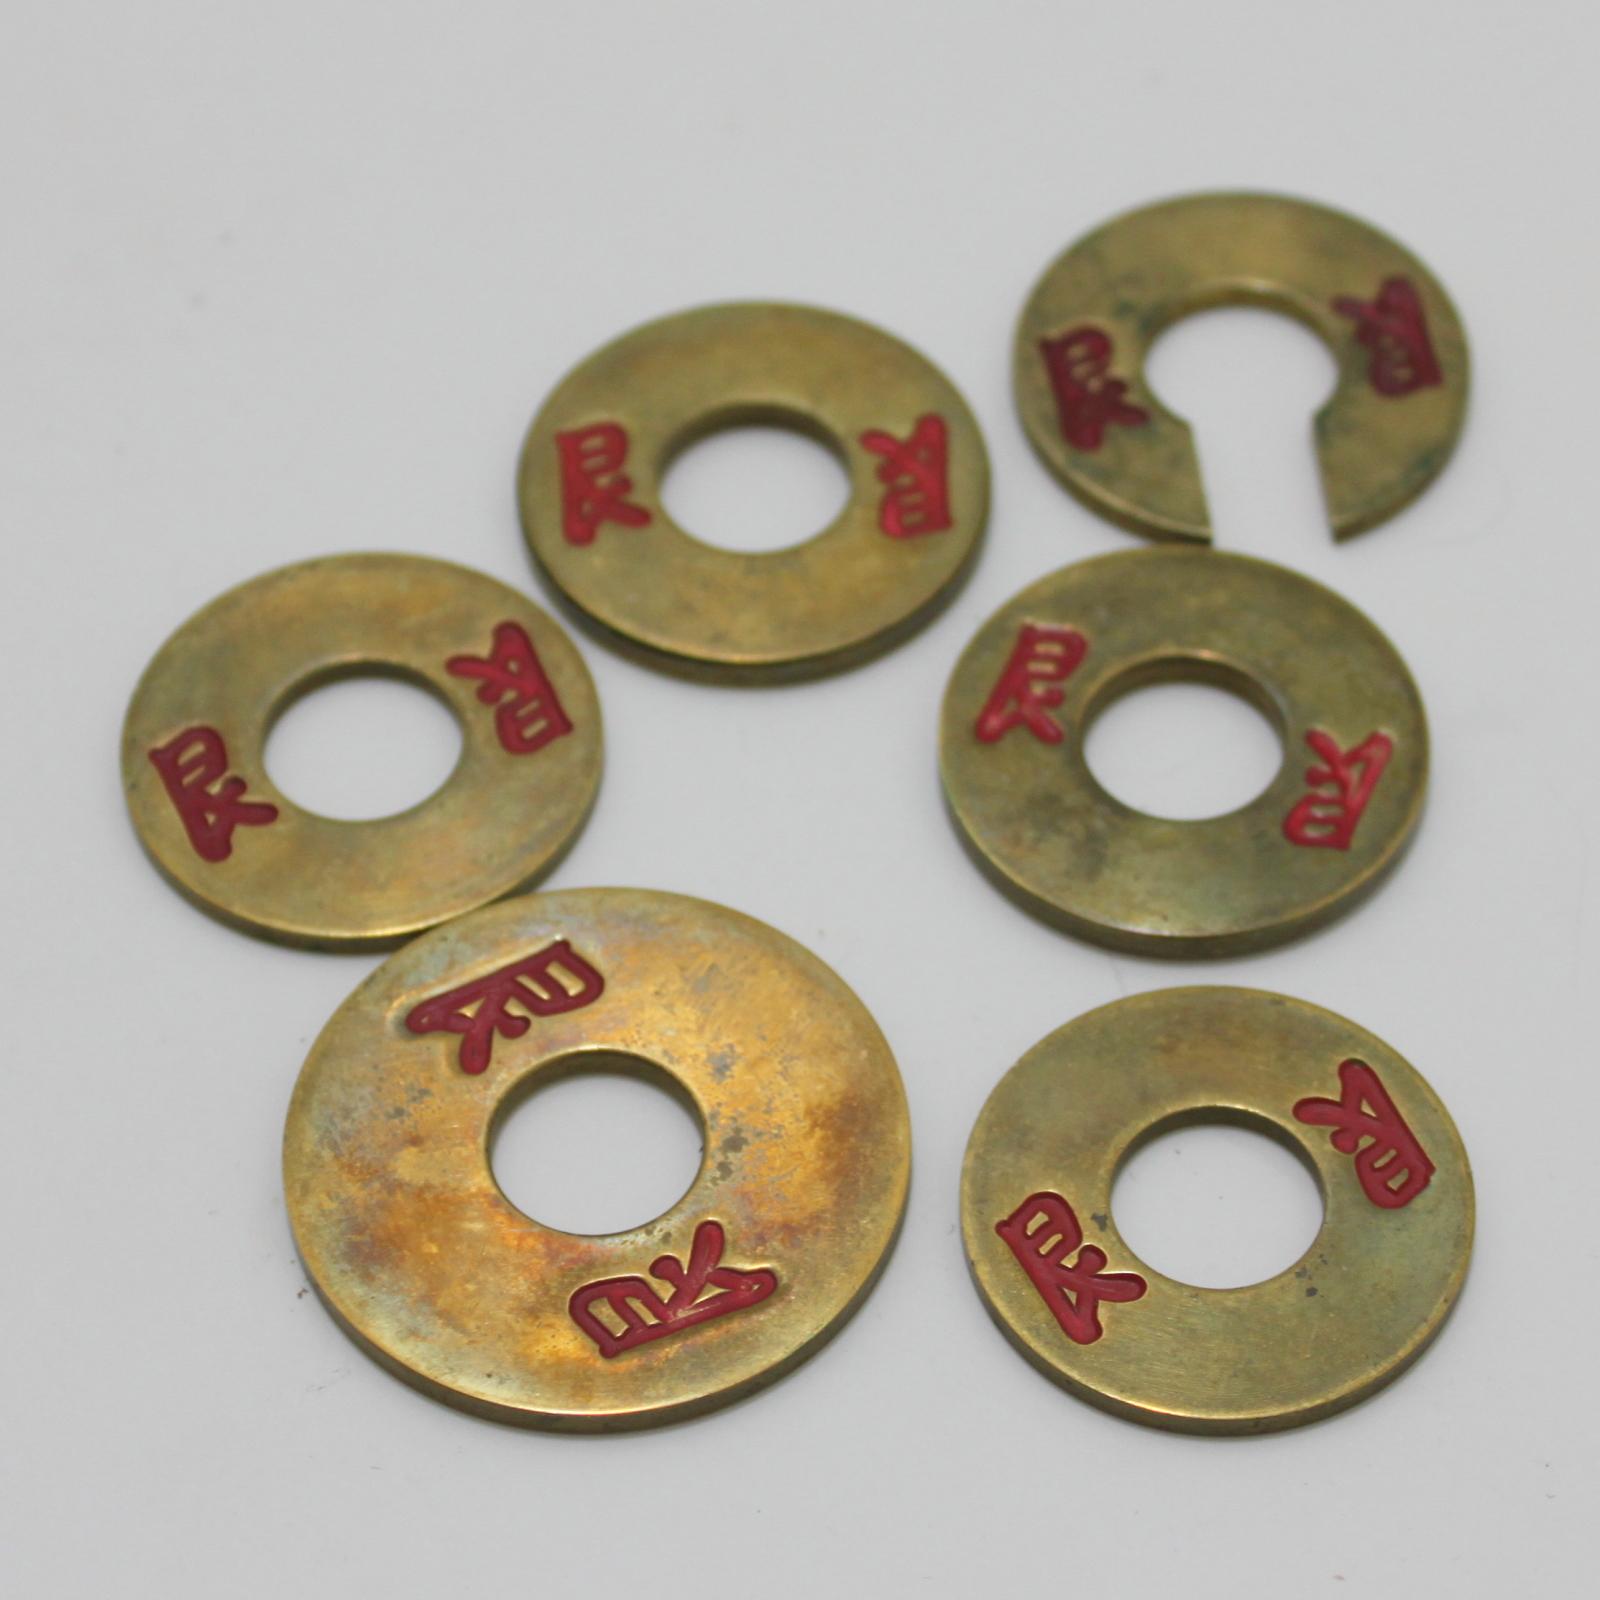 Beggar Coins by Hank Moorehouse